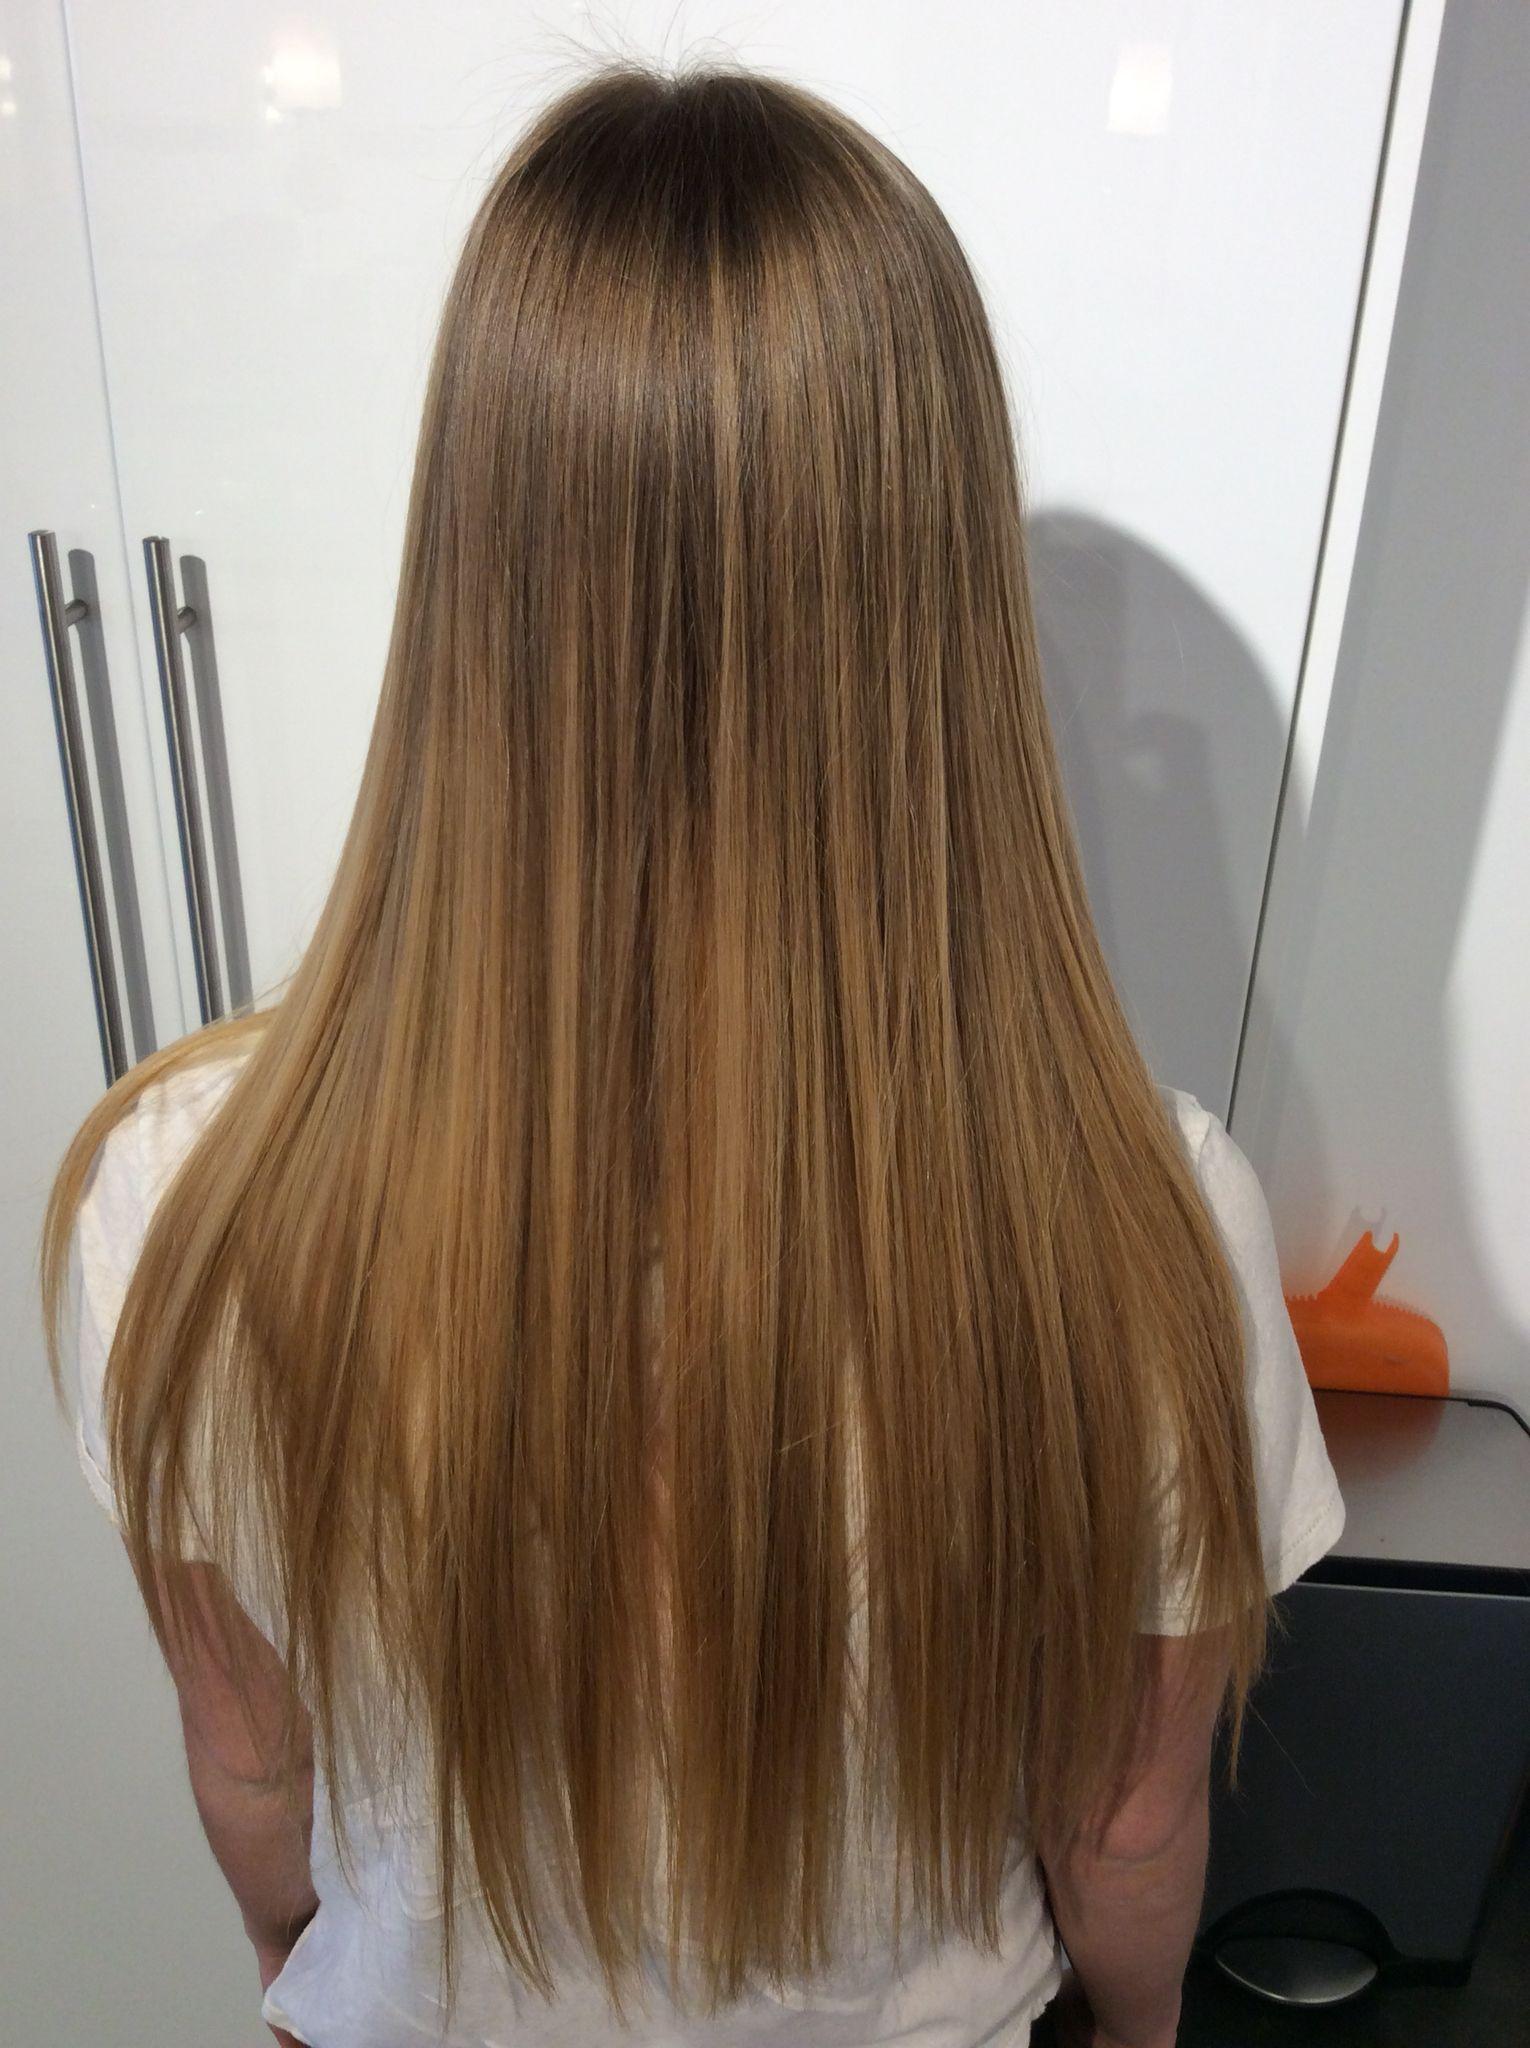 Soft Golden Blonde Ombre Balayage On Long Straight Hair Straight Hairstyles Blonde Ombre Balayage Balayage